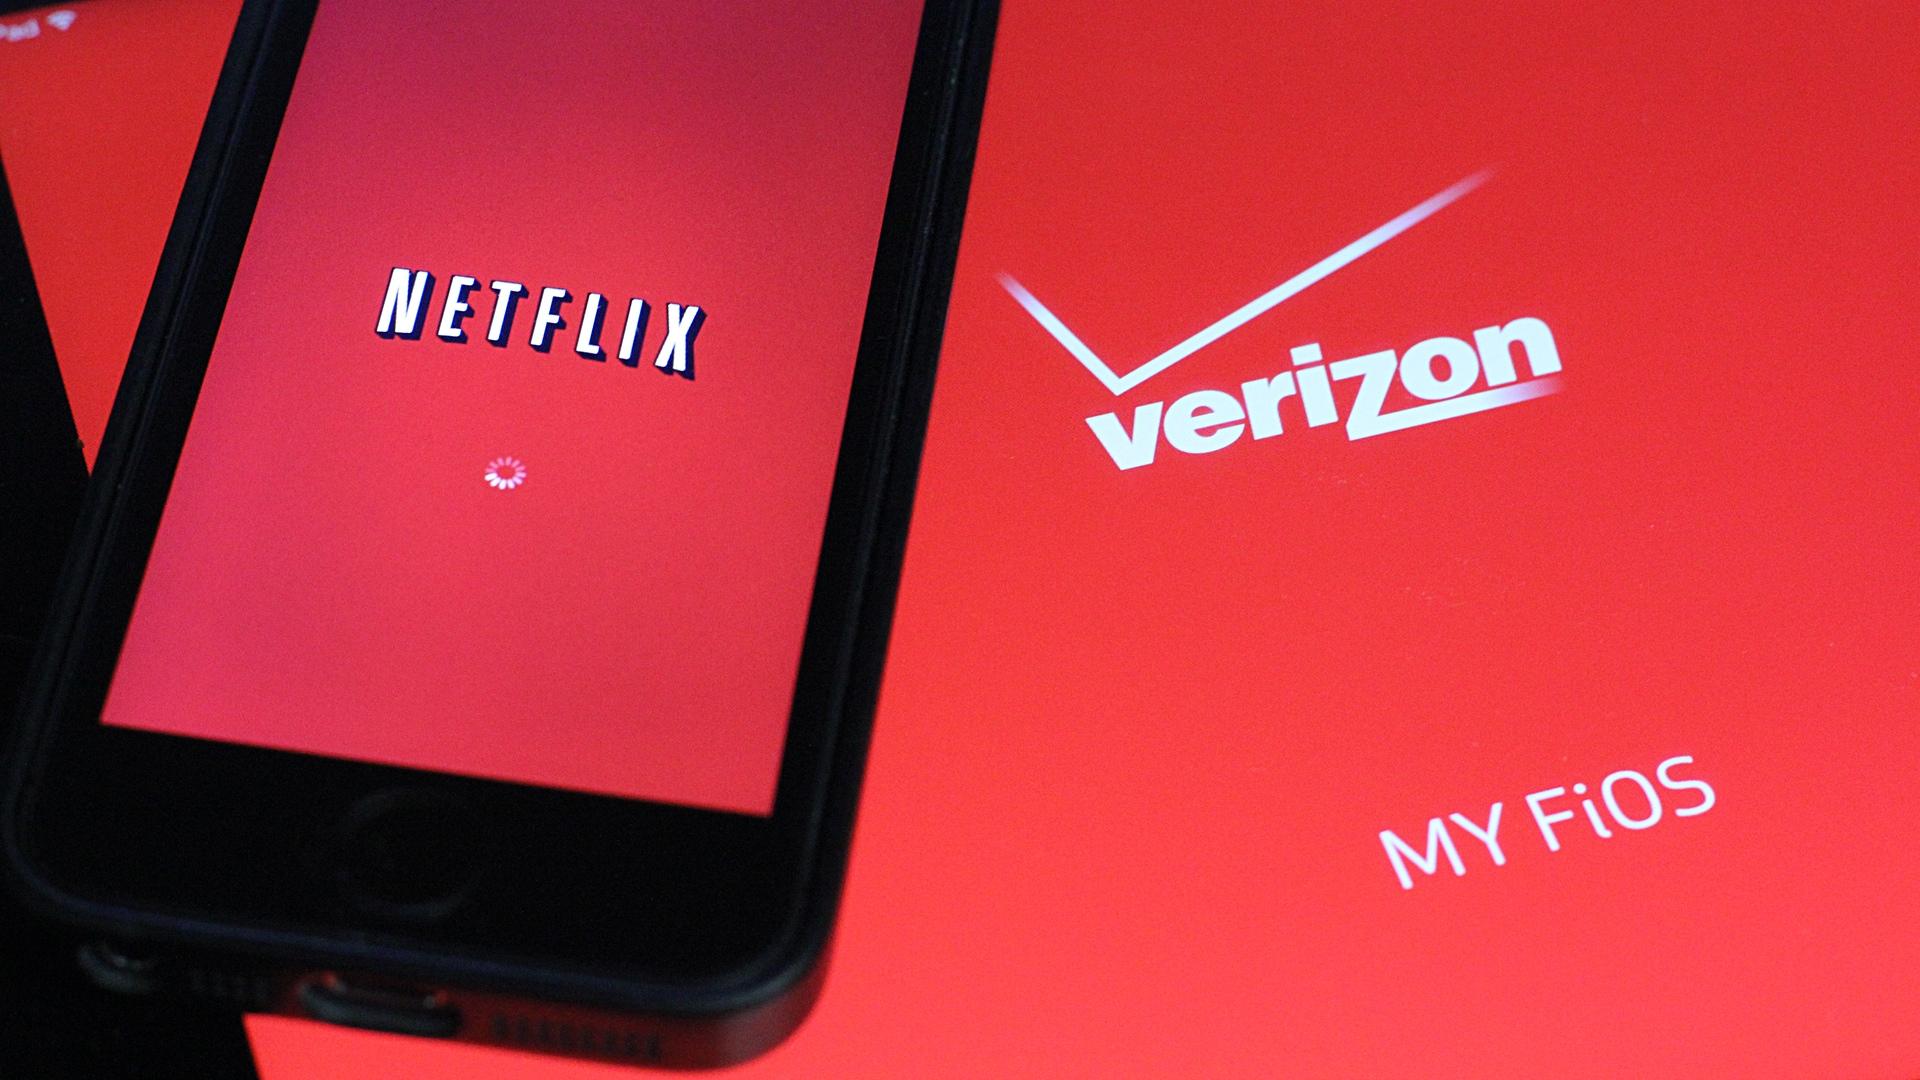 Netflix and Verizon